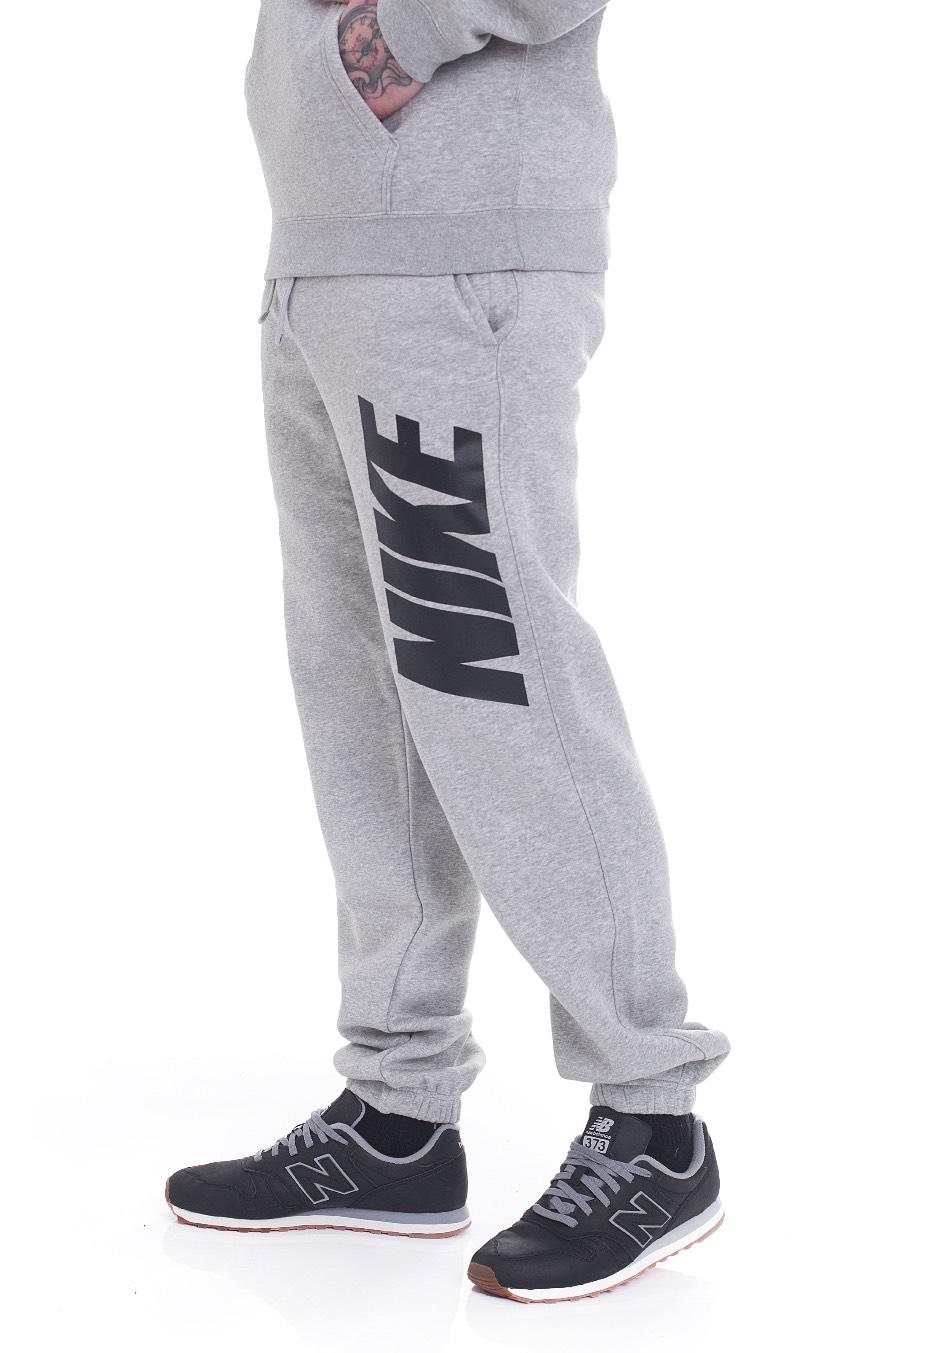 4cd91db7b Nike - NSW GX JDI Dark Grey Heather Black - Tracksuit - Negozio di ...